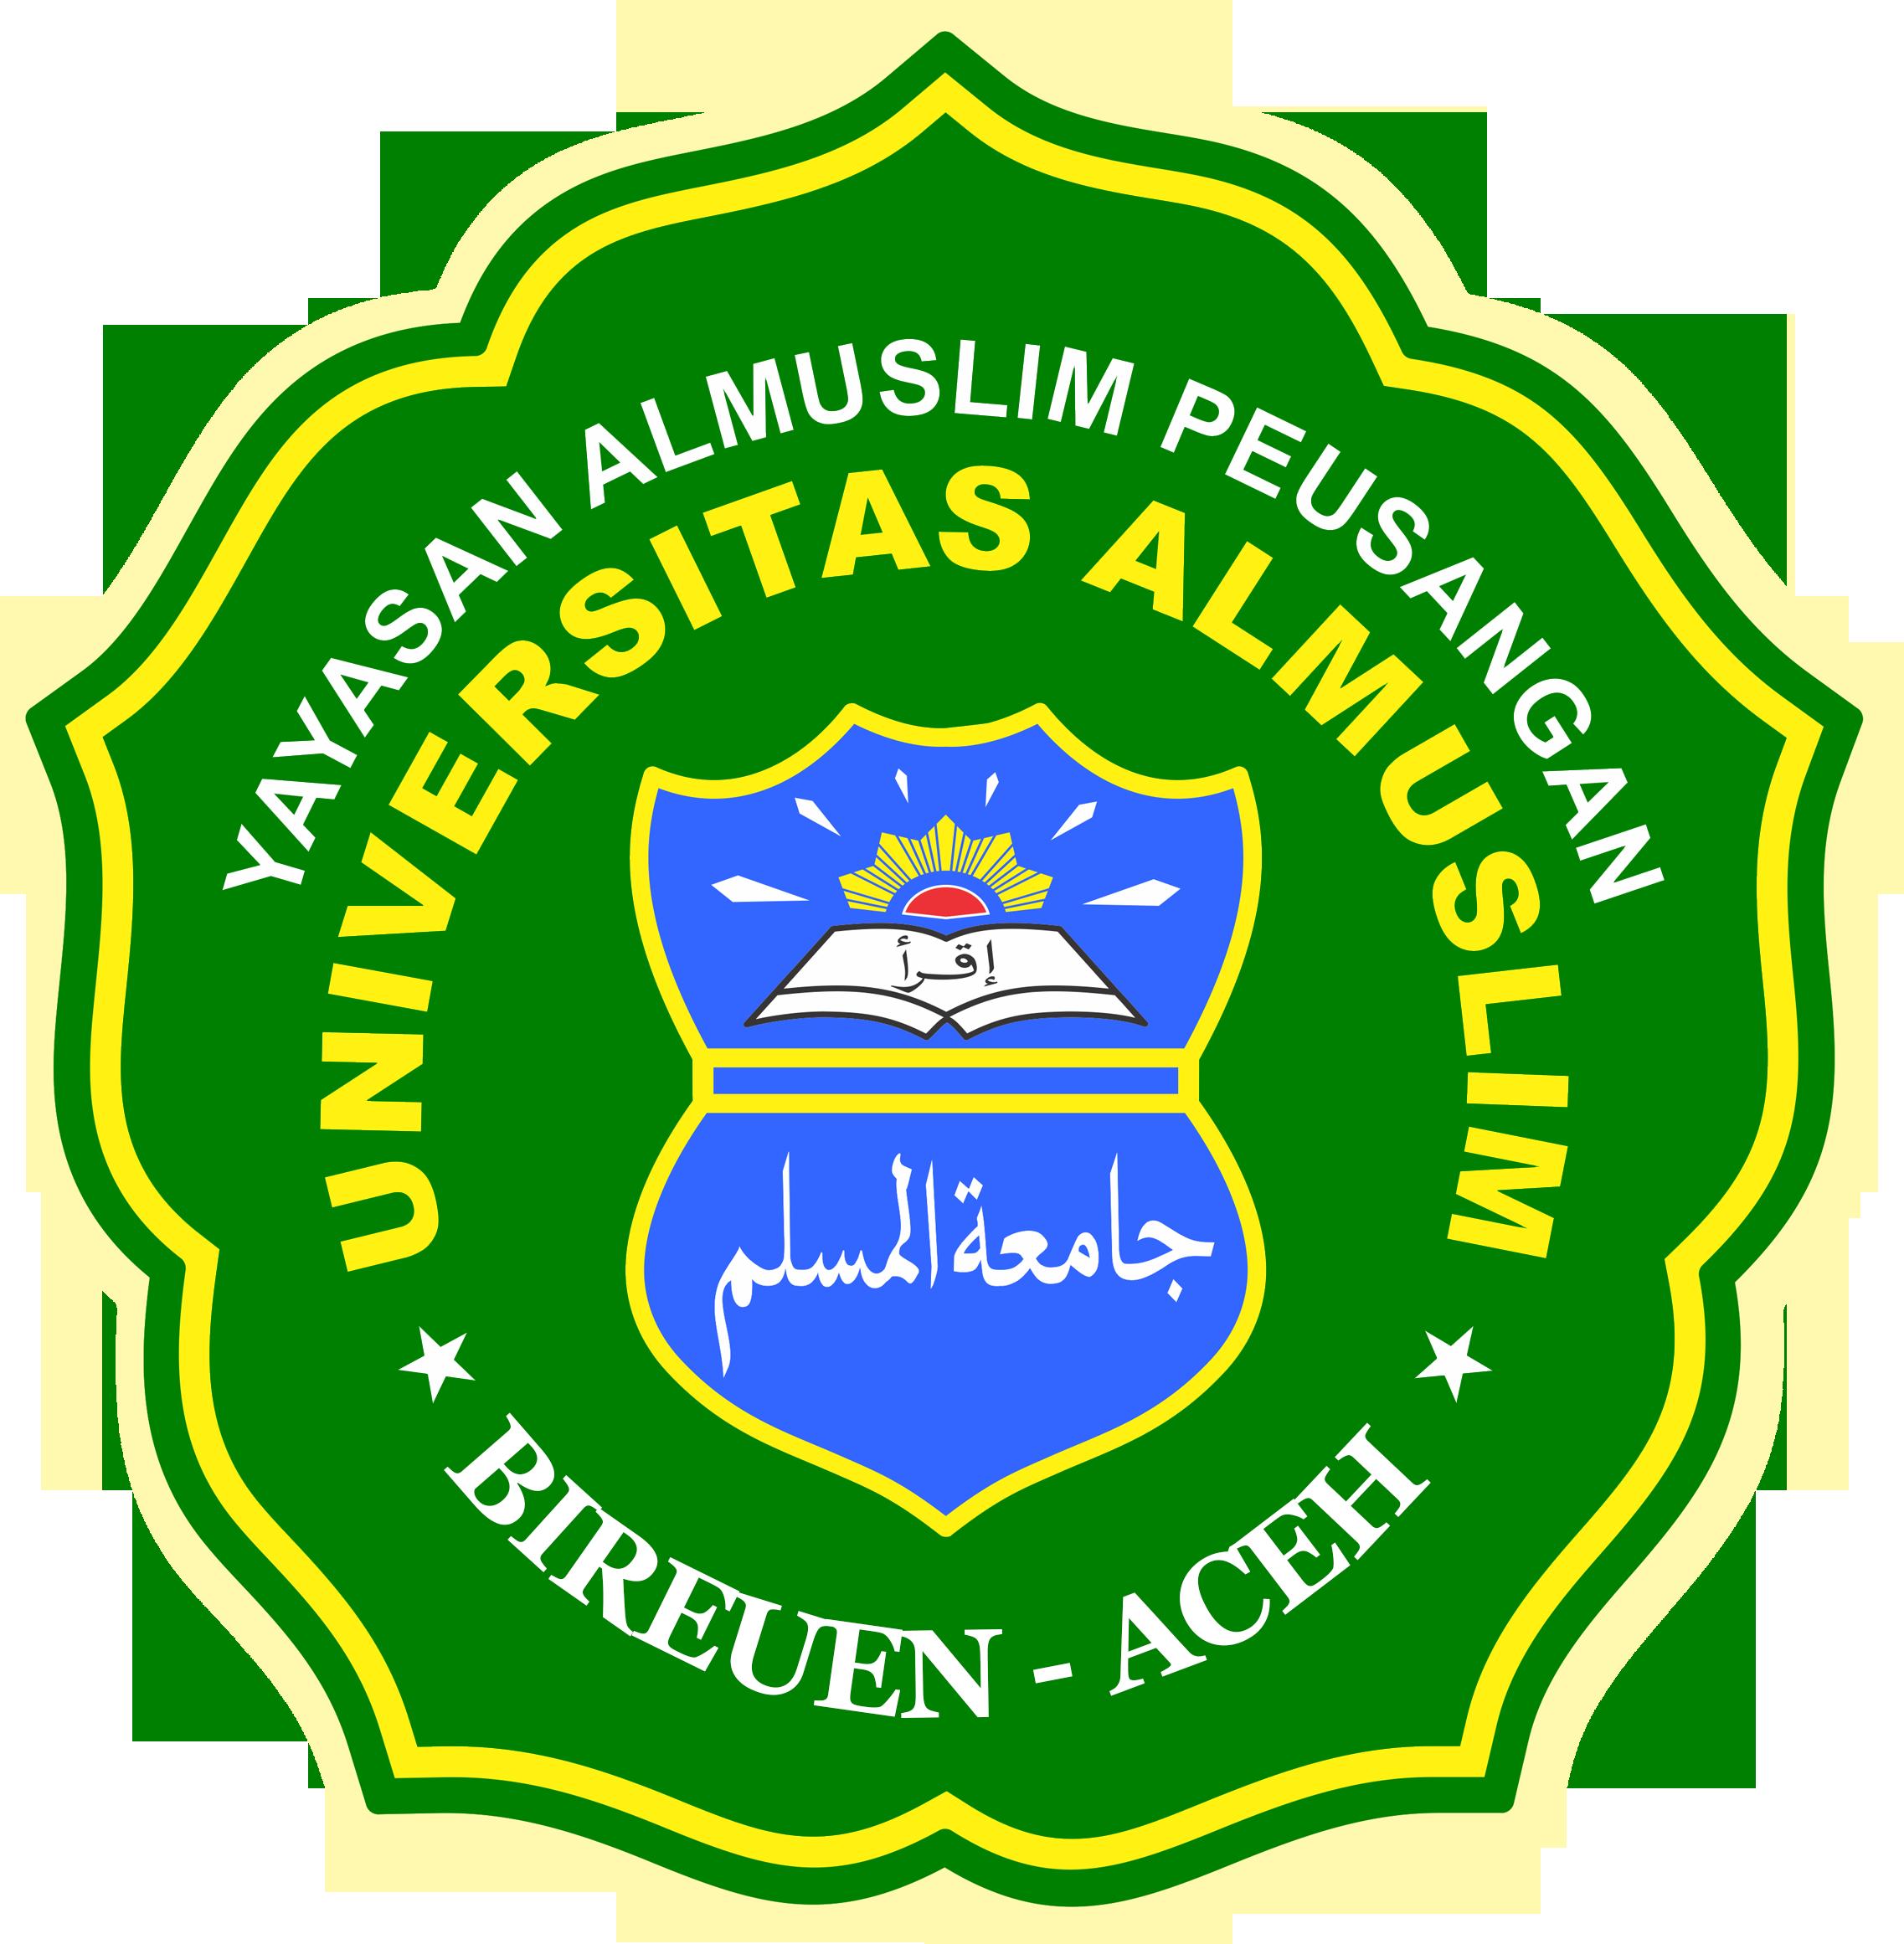 UNIV ALMUSLIM